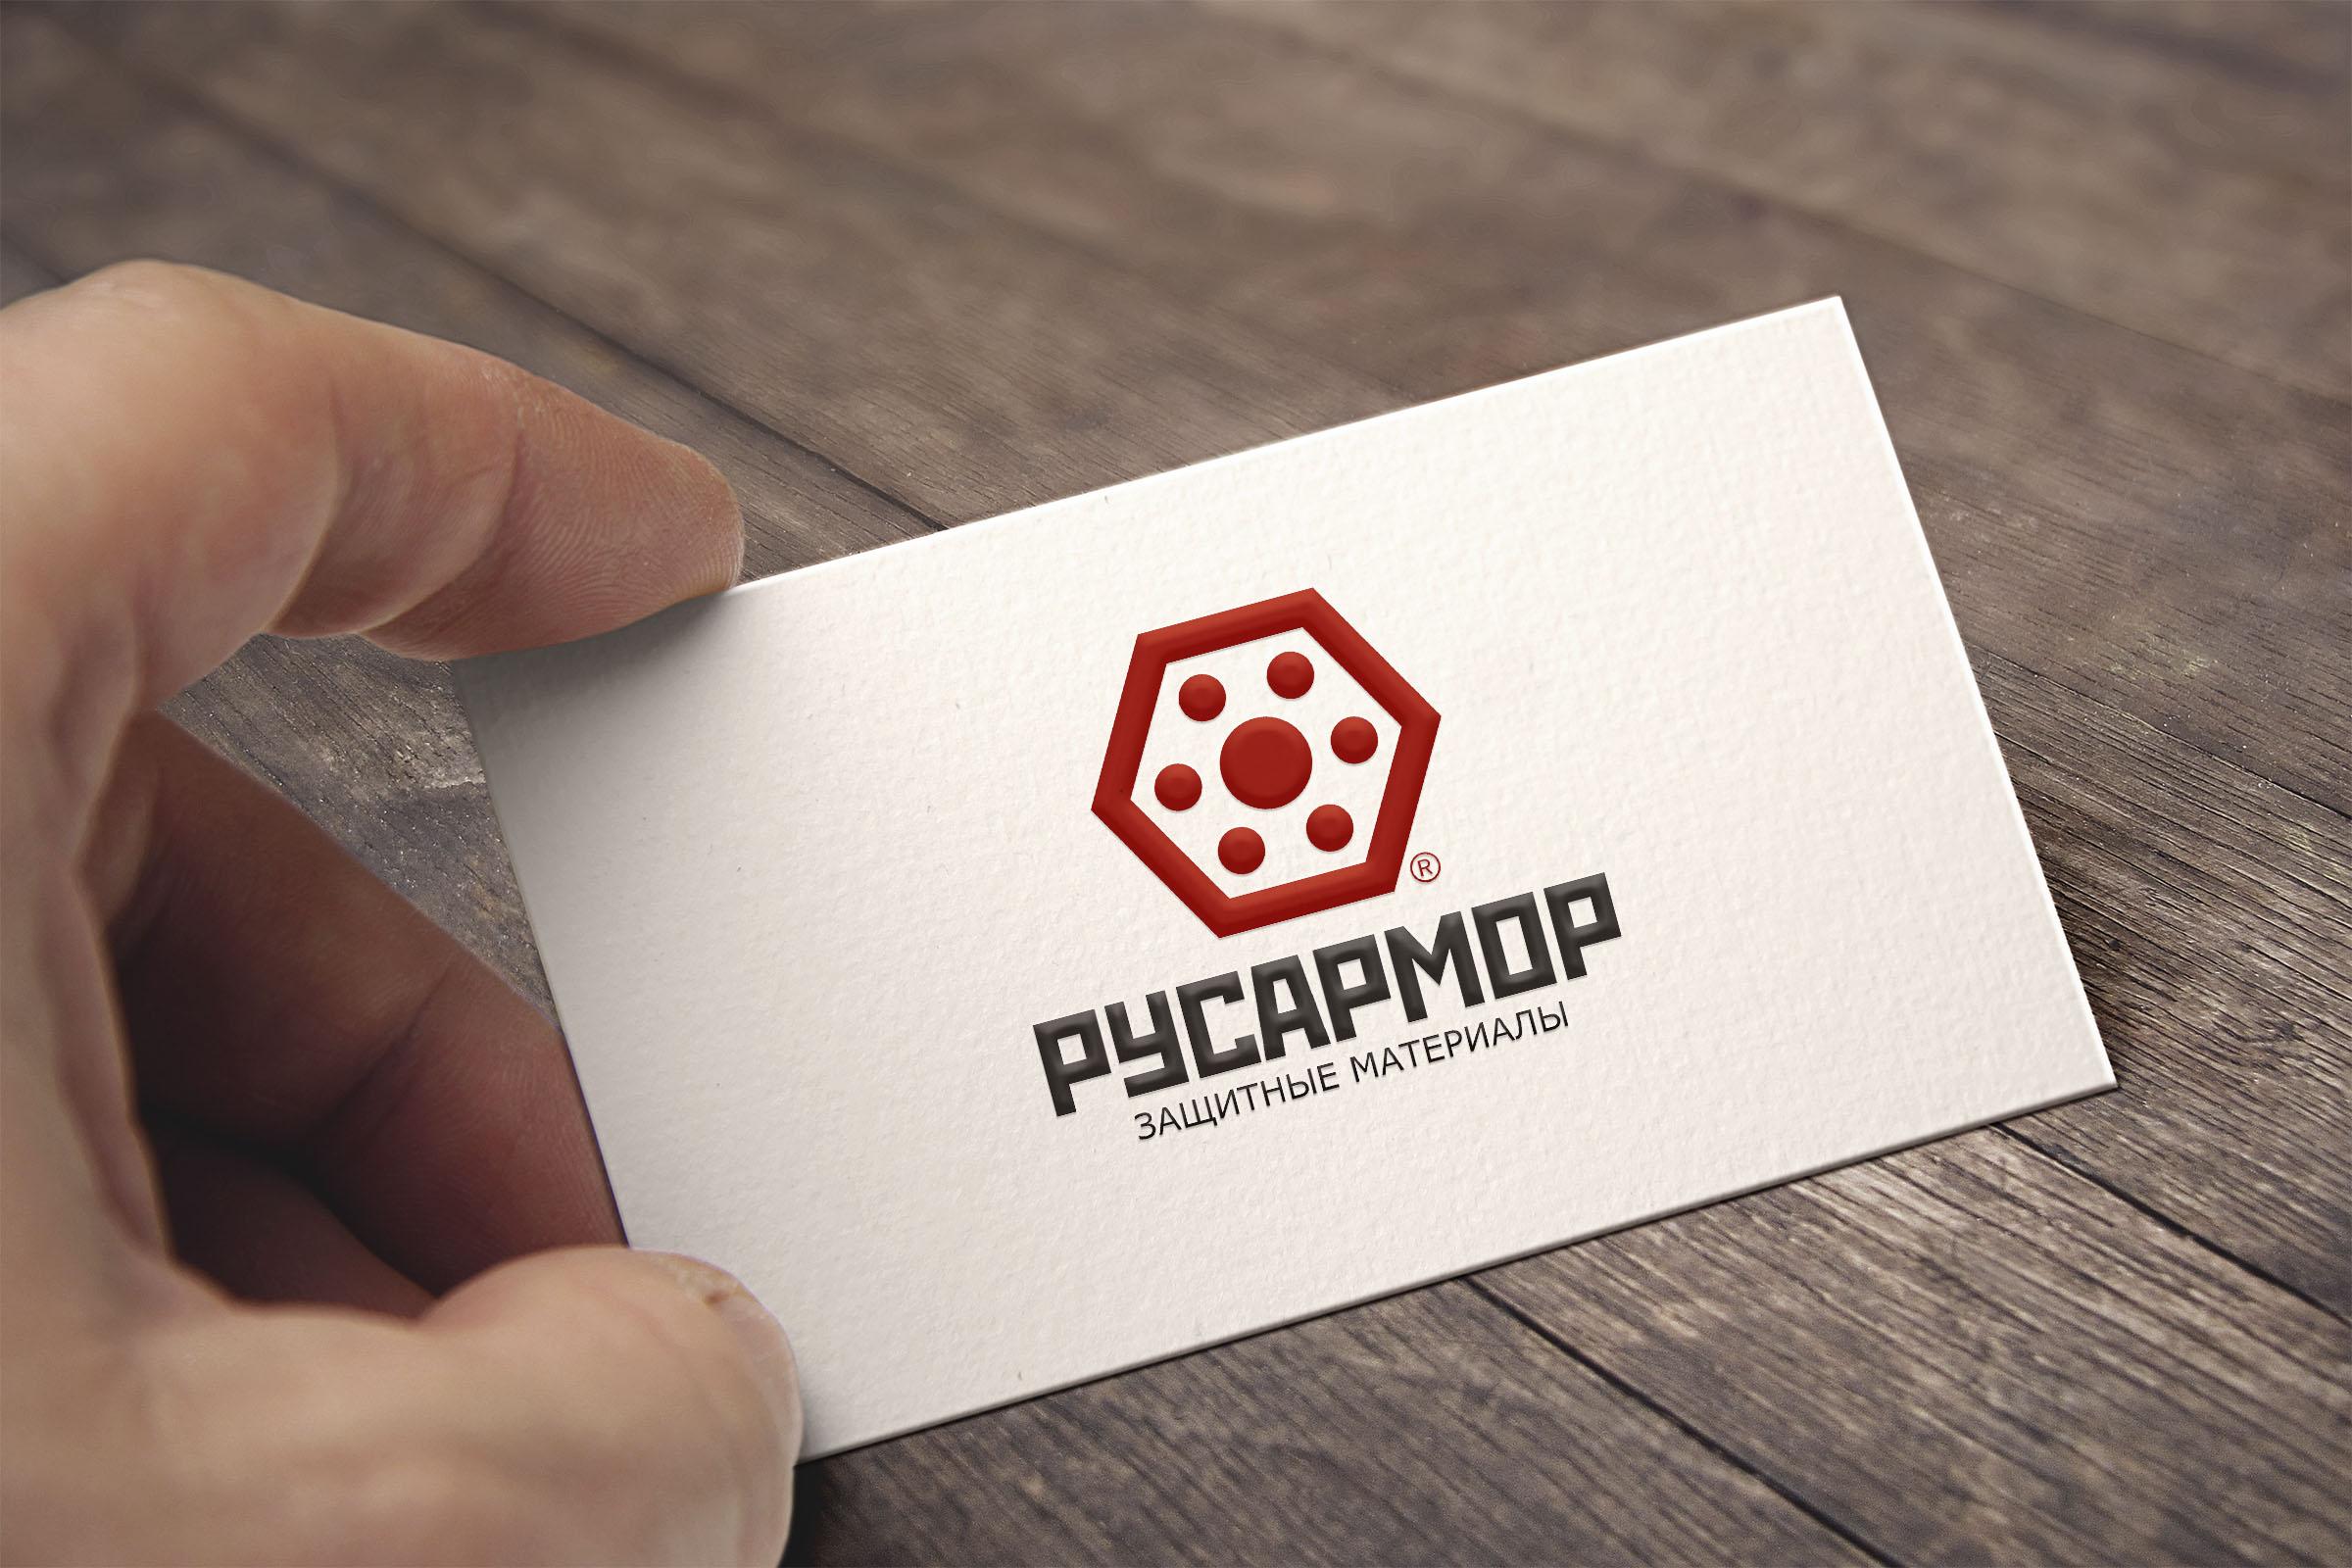 Разработка логотипа технологического стартапа РУСАРМОР фото f_4605a09582213caa.jpg